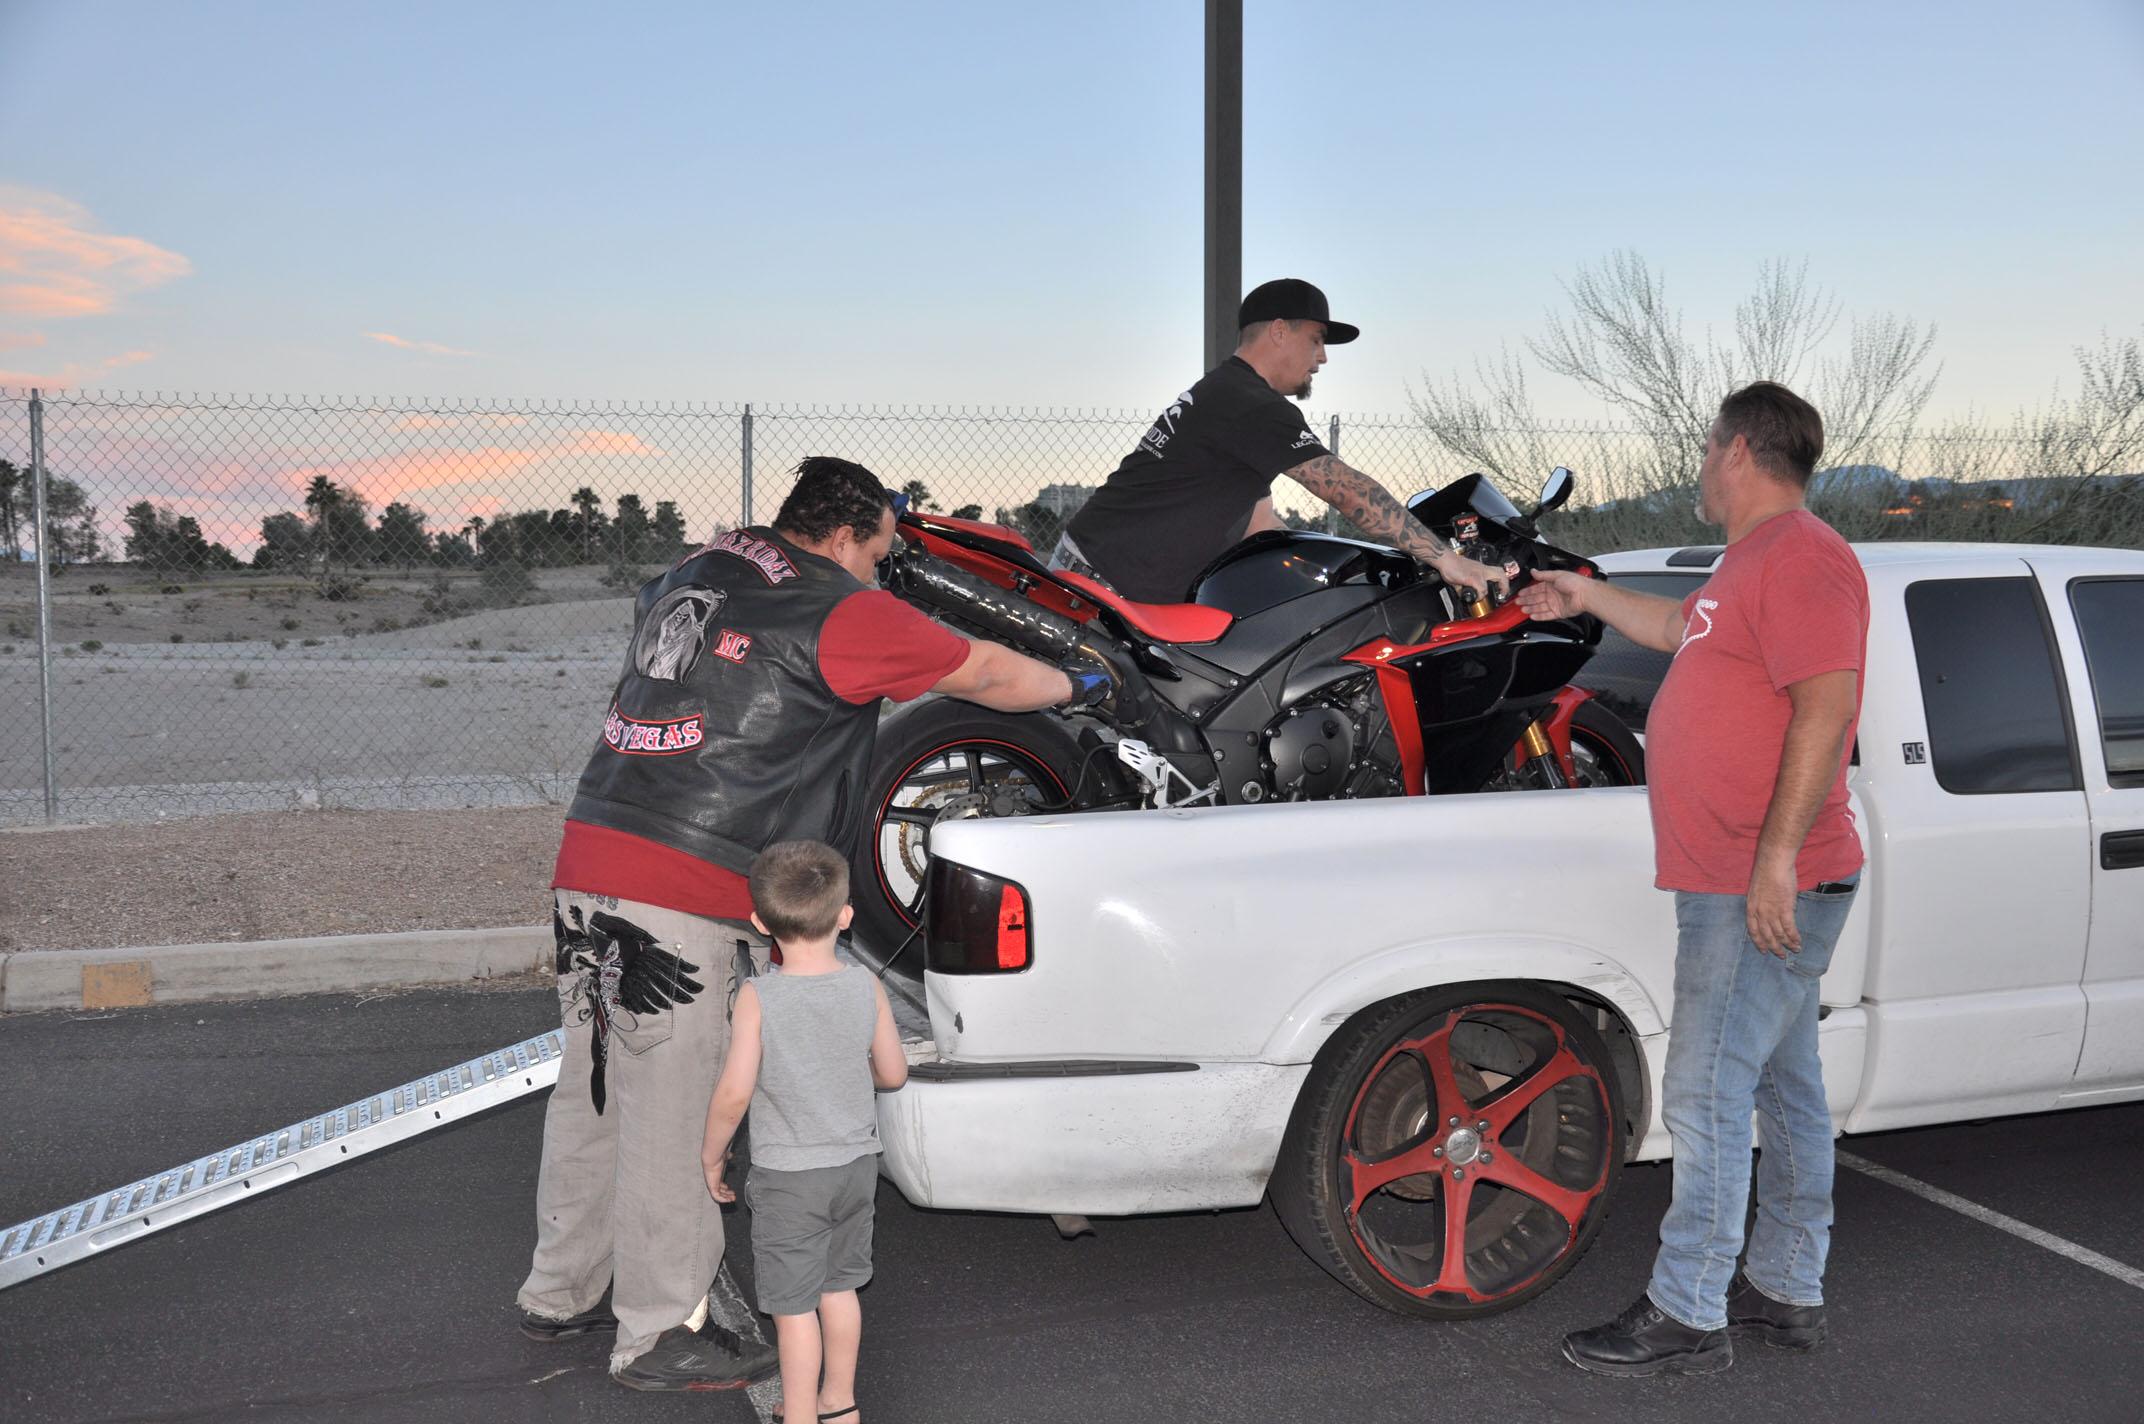 Riders Helping Riders.